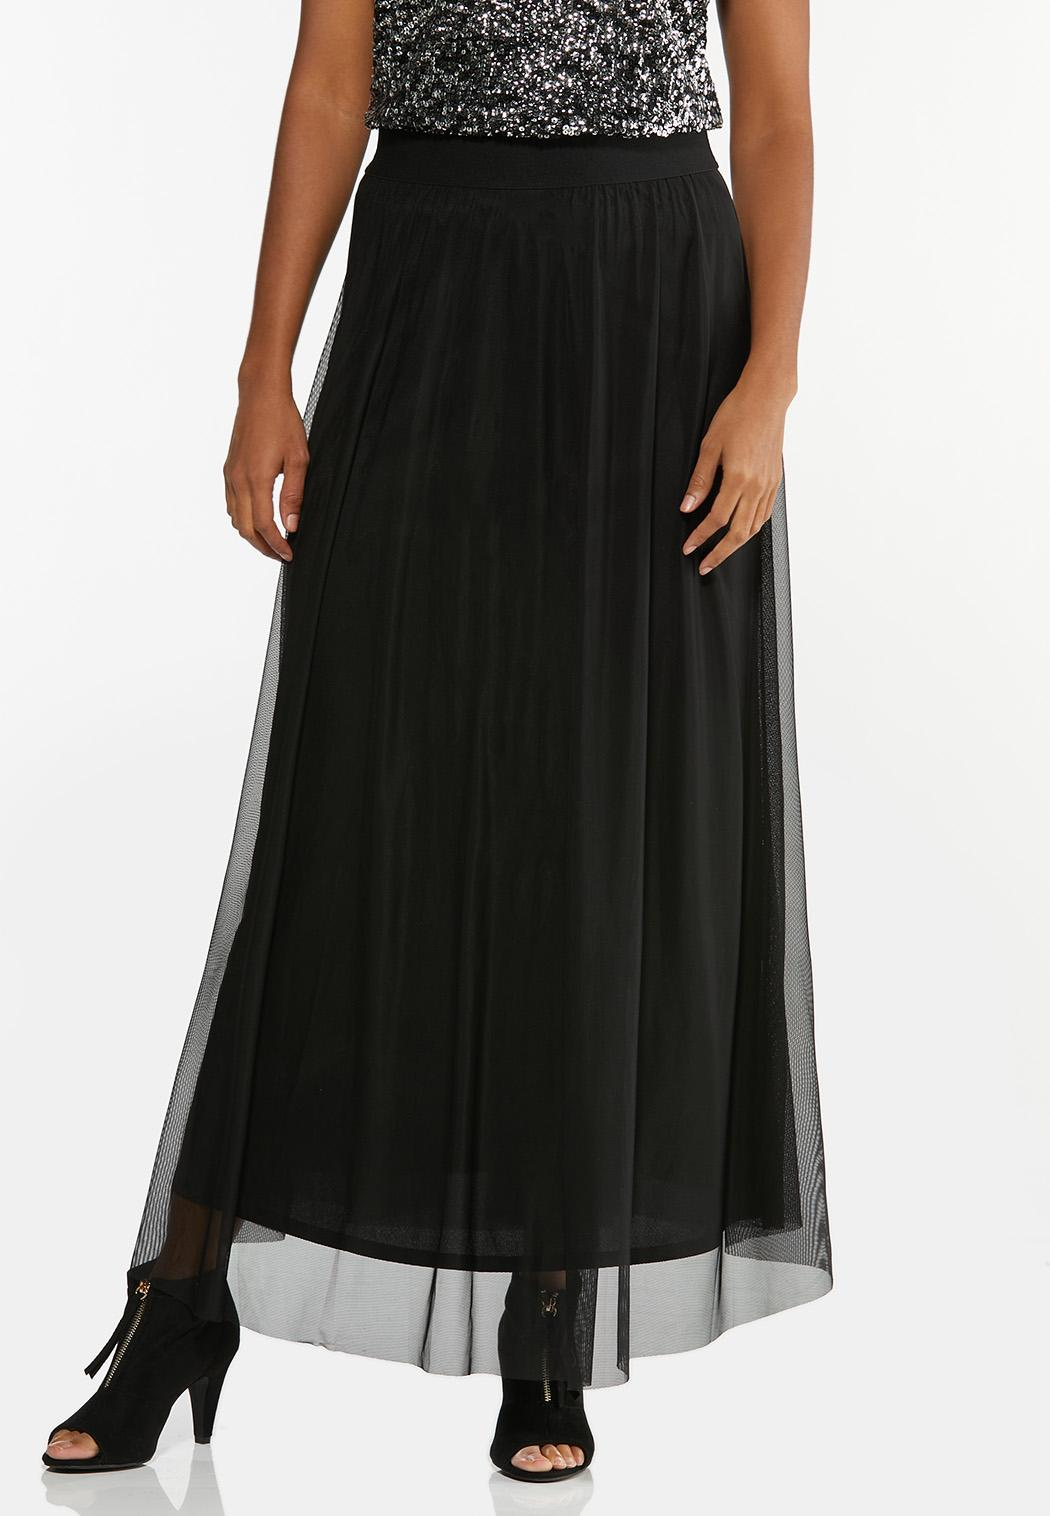 Plus Size Lavender Mesh Maxi Skirt